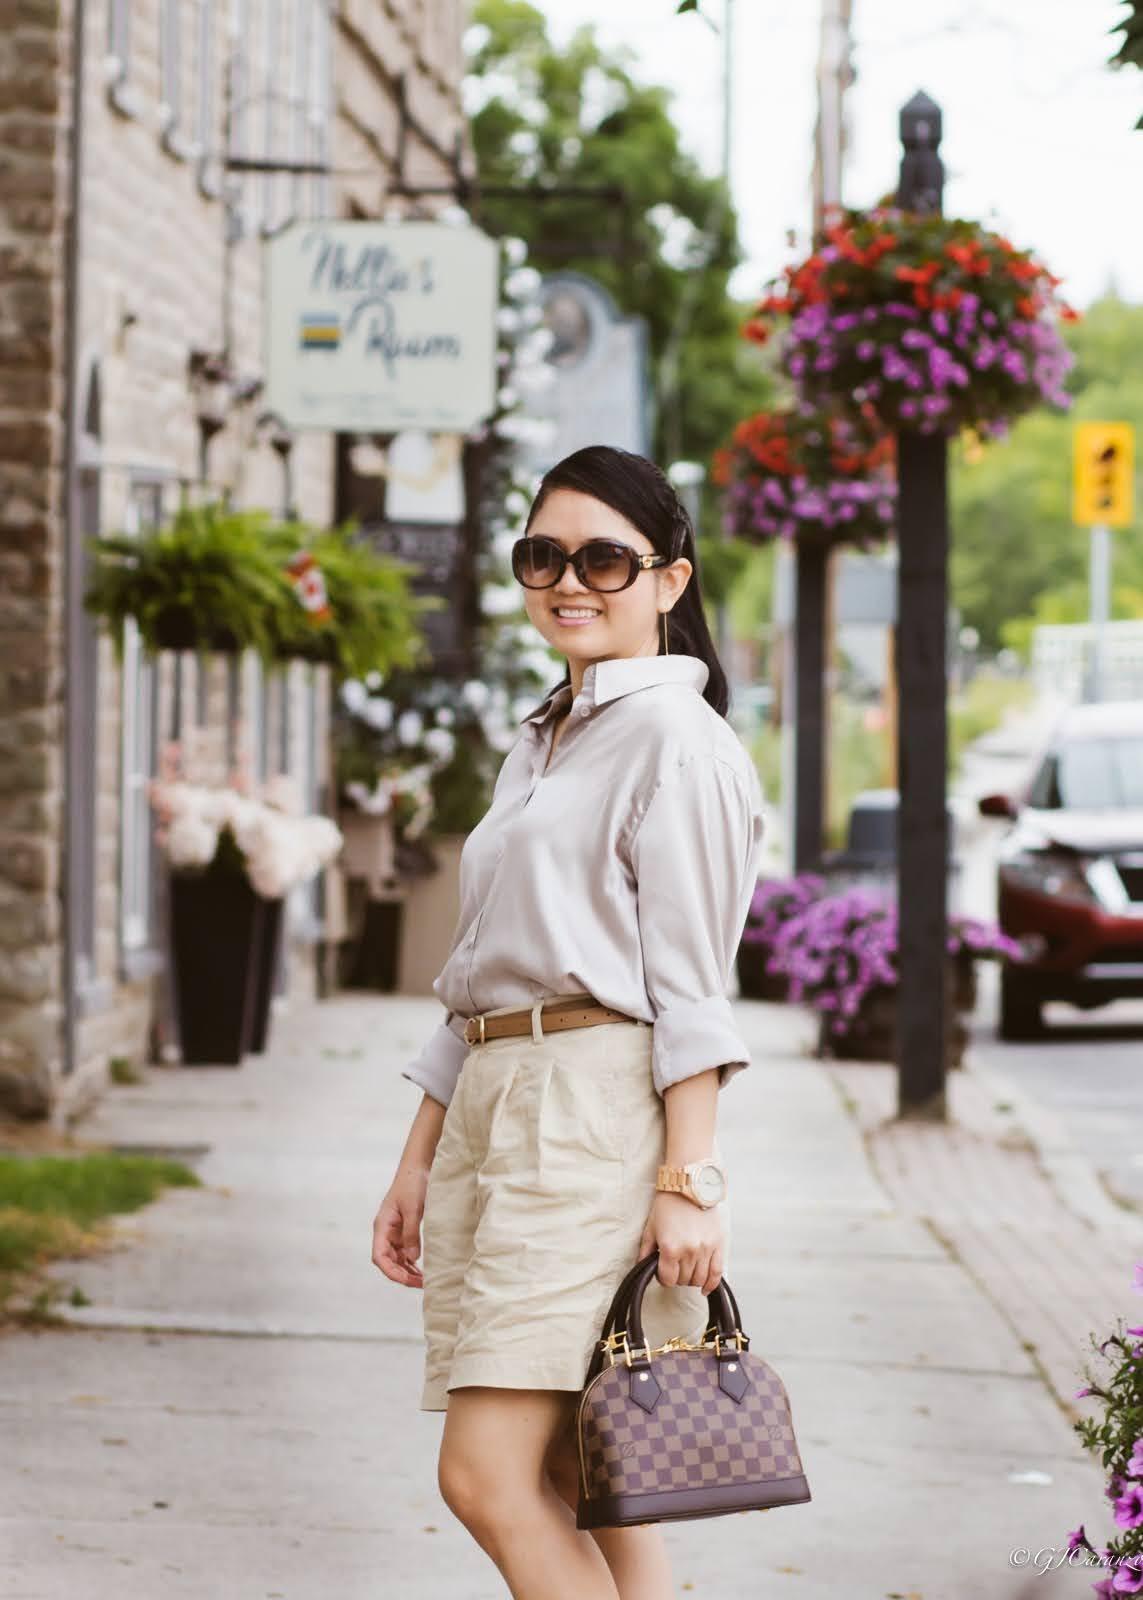 hm satin shirt_uniqlo linen shorts_gold slides_louis vuitton almabb bag_gucci sunglasses_konifer wood watch